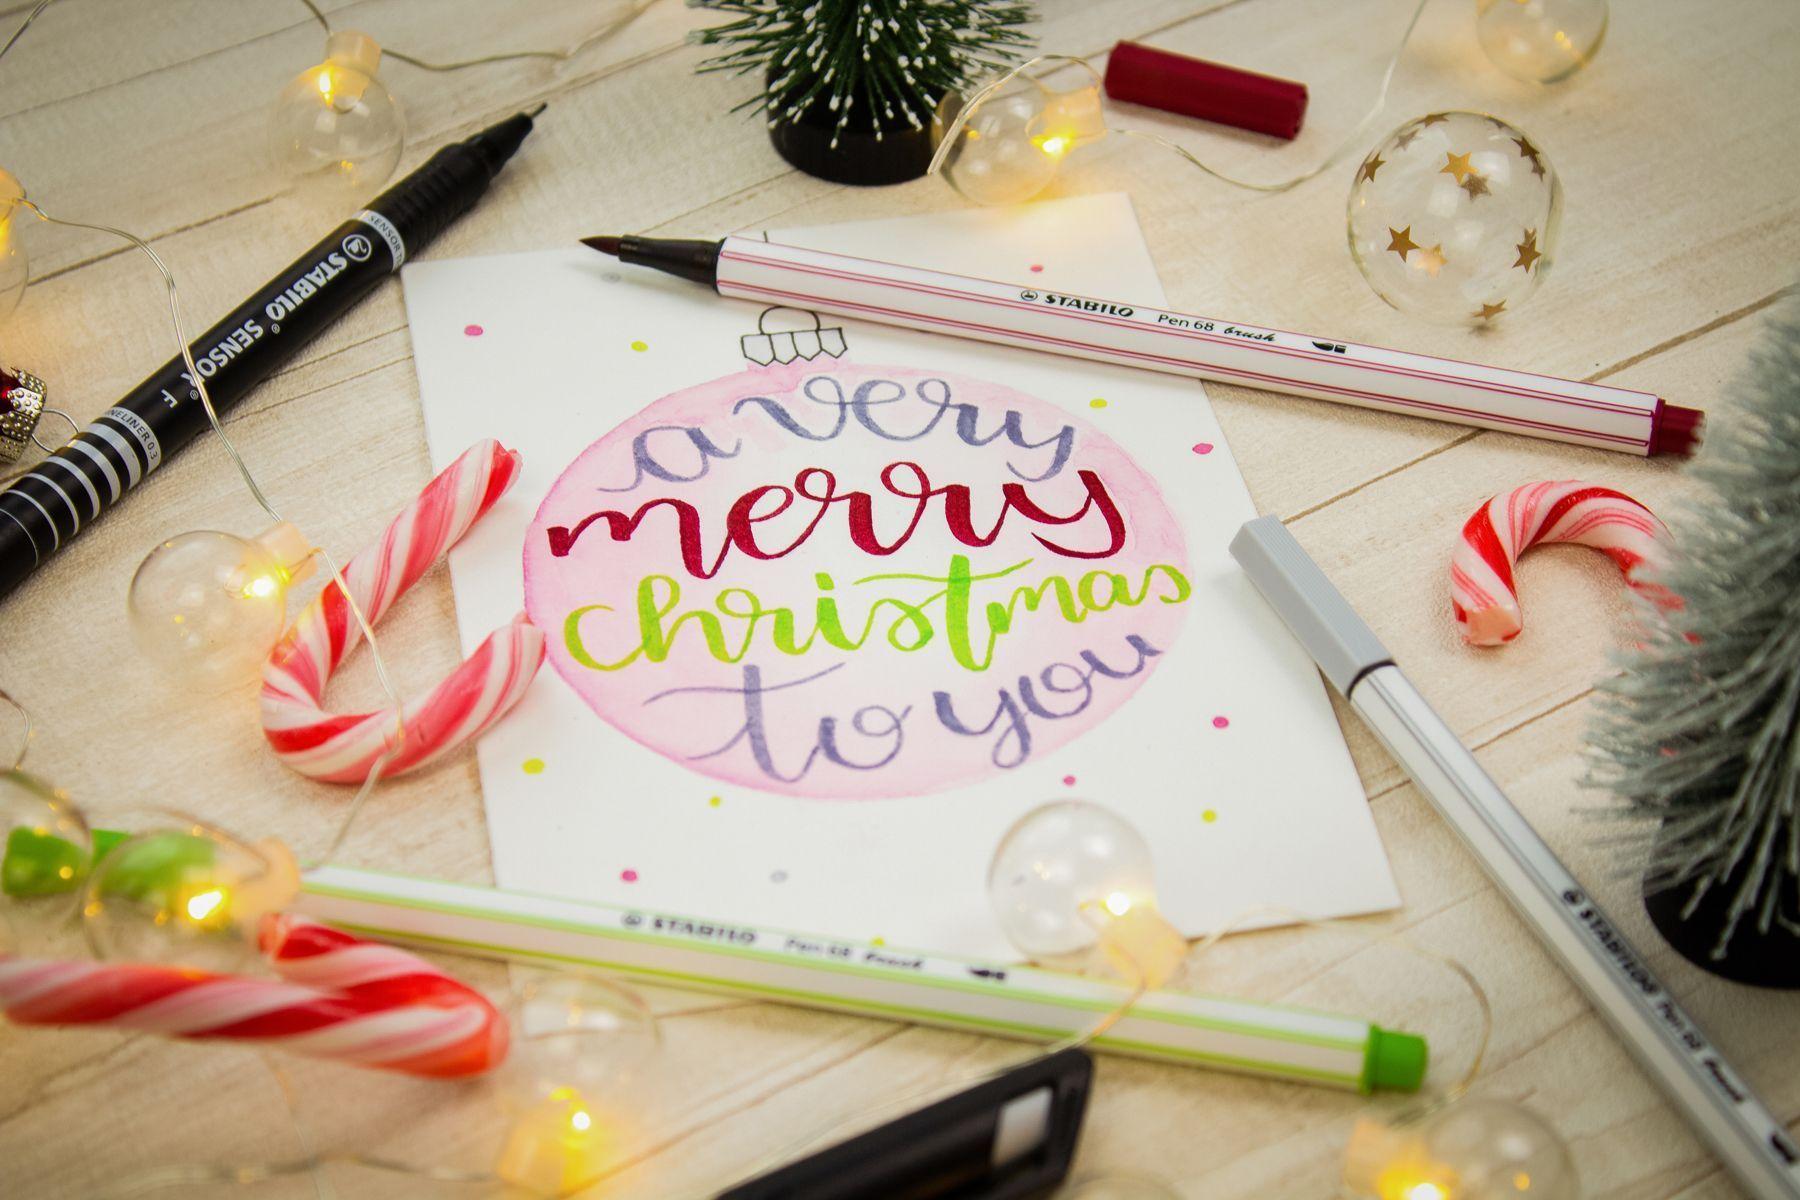 A very merry christmas  mit dem STABILO Pen 68 brush  A very merry christmas  mit dem STABILO Pen 68 brush